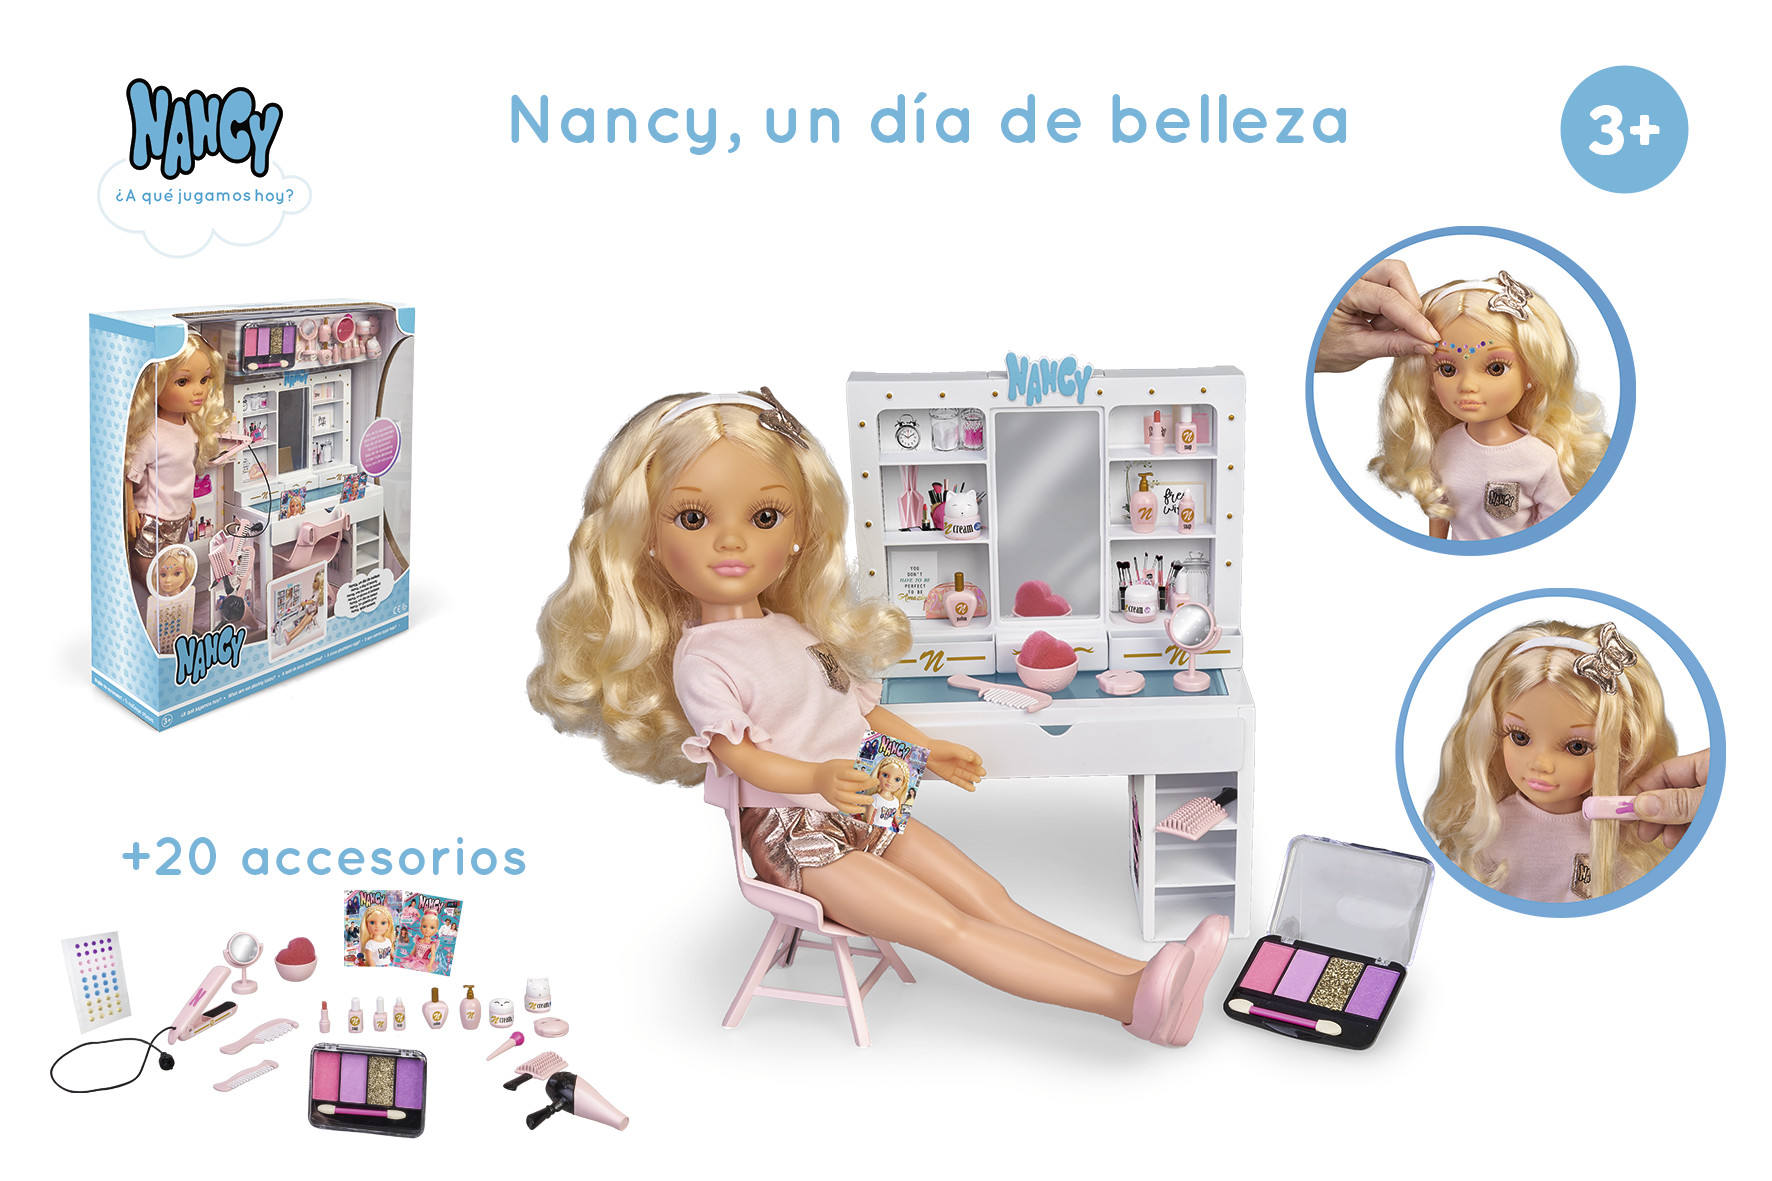 NANCY UN DIA DE BELLEZA 15787 - N36420